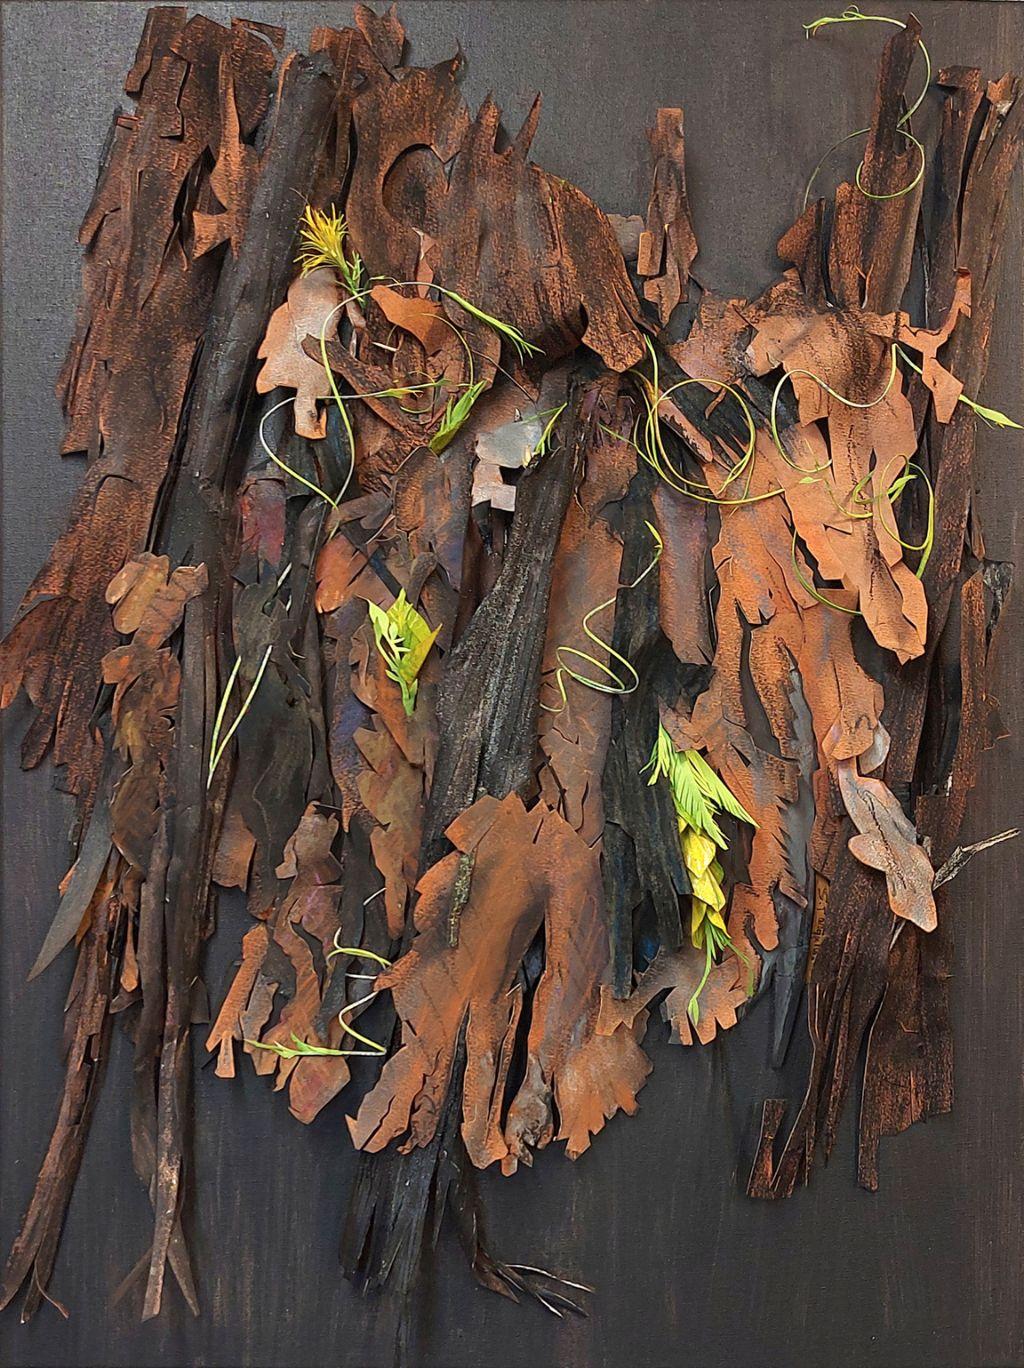 "Susan Farquhar, Epicormic 2, Paper cut, collage, soft pastel, 24"" x 18"" (Framed $25.5"" x 18.5""), $1200 Framed"